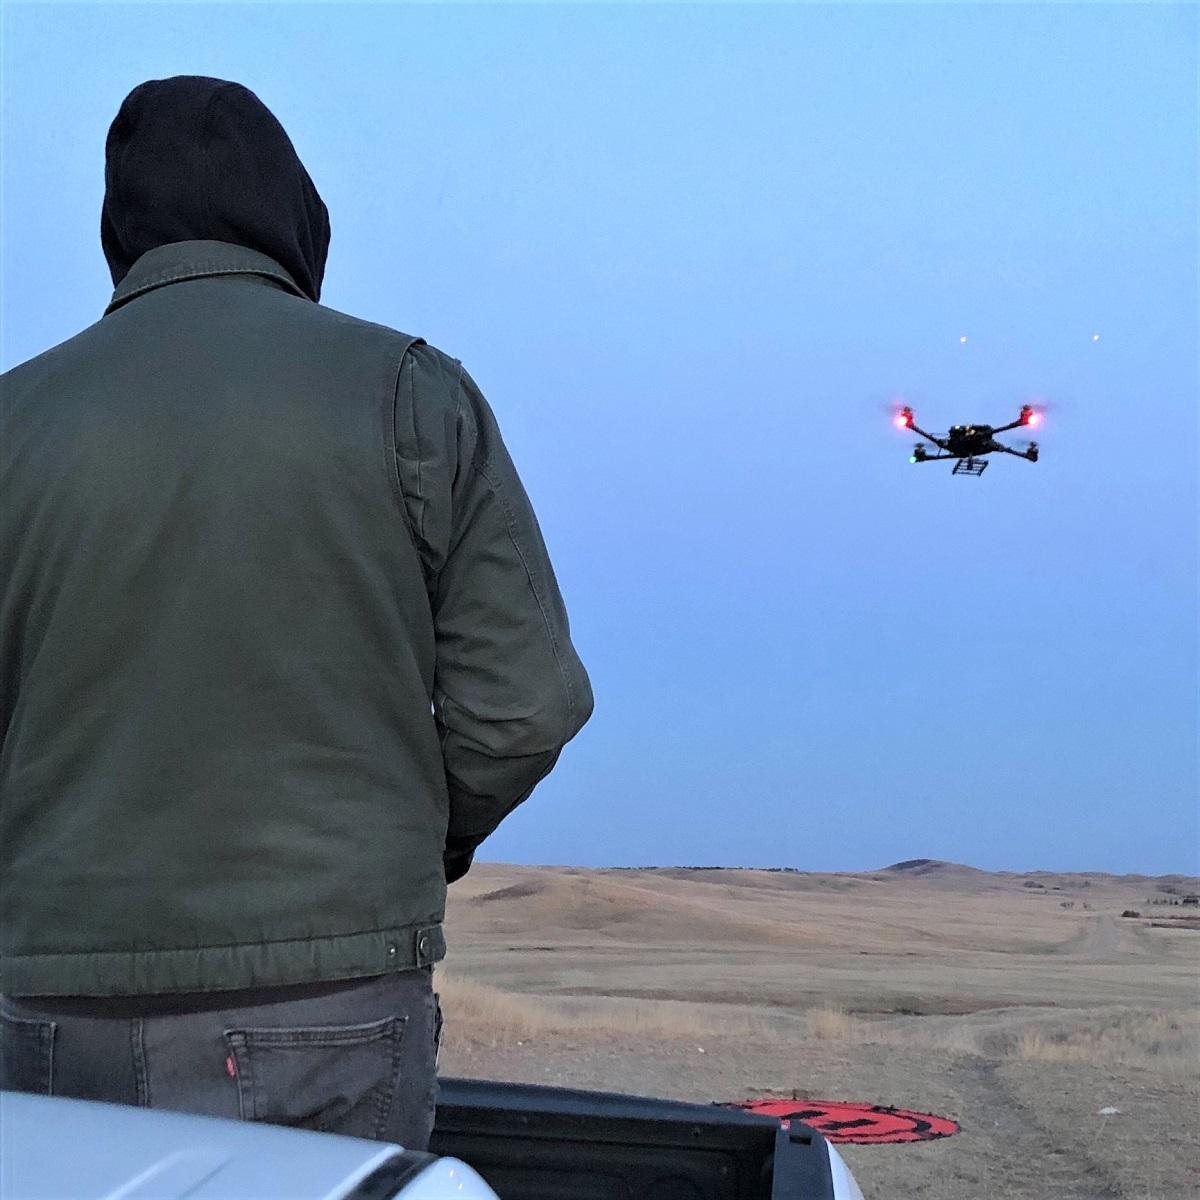 An Unmanned Aircraft System pilot simulates an evening surveillance flight with an Alta X drone.